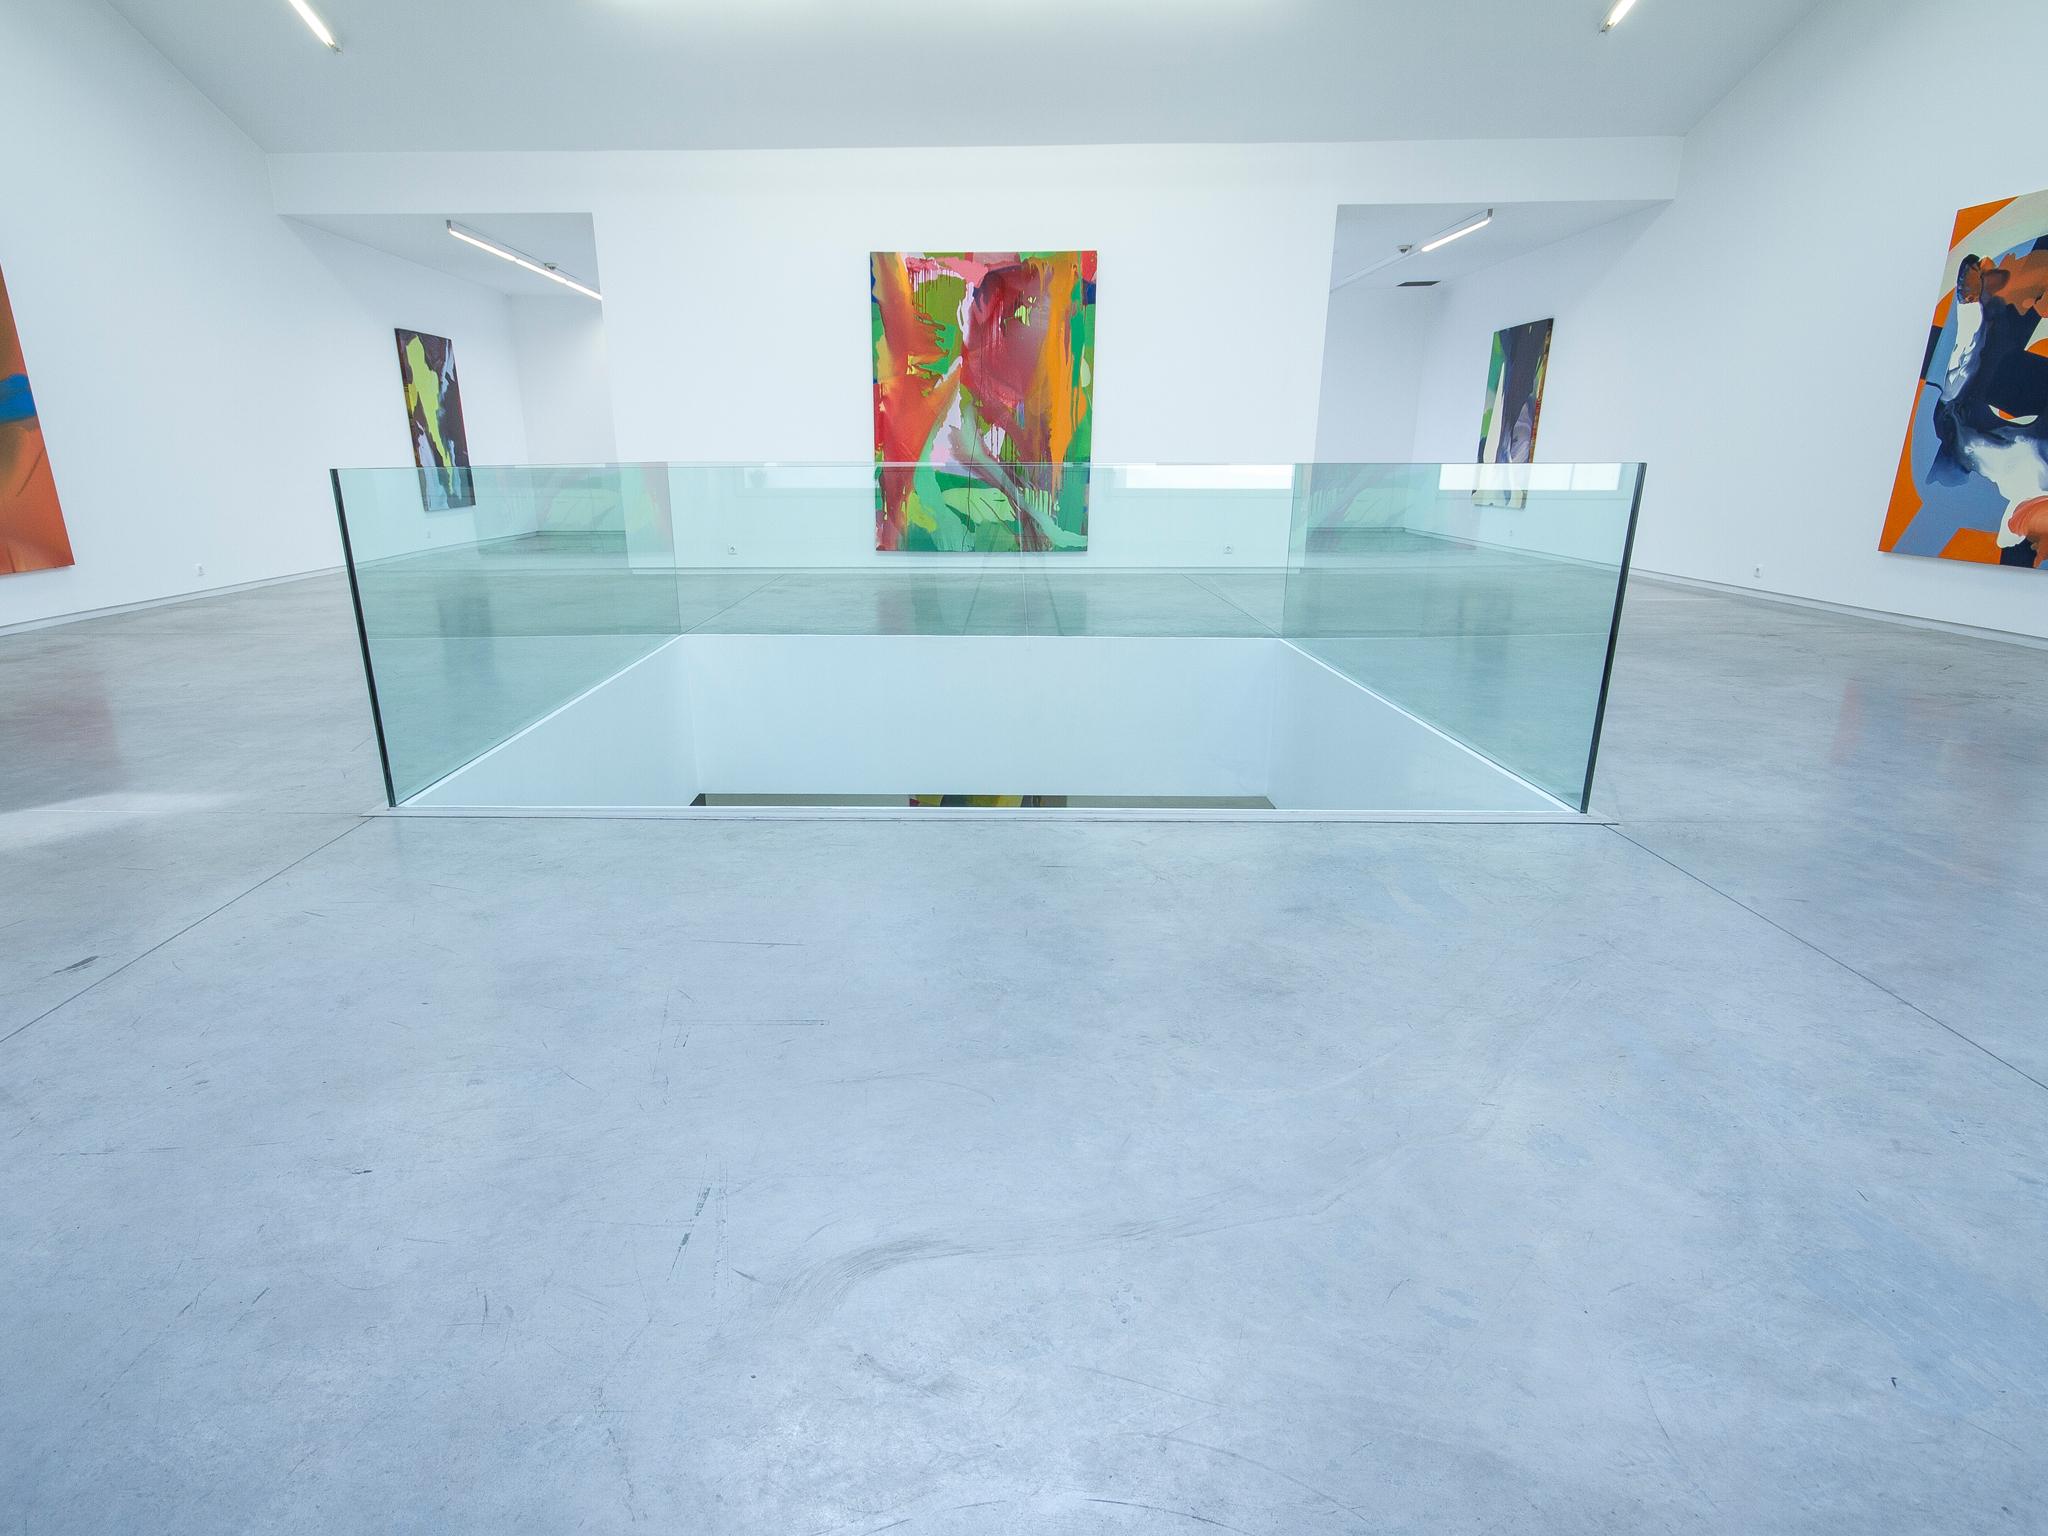 8 amazing art galleries in Porto